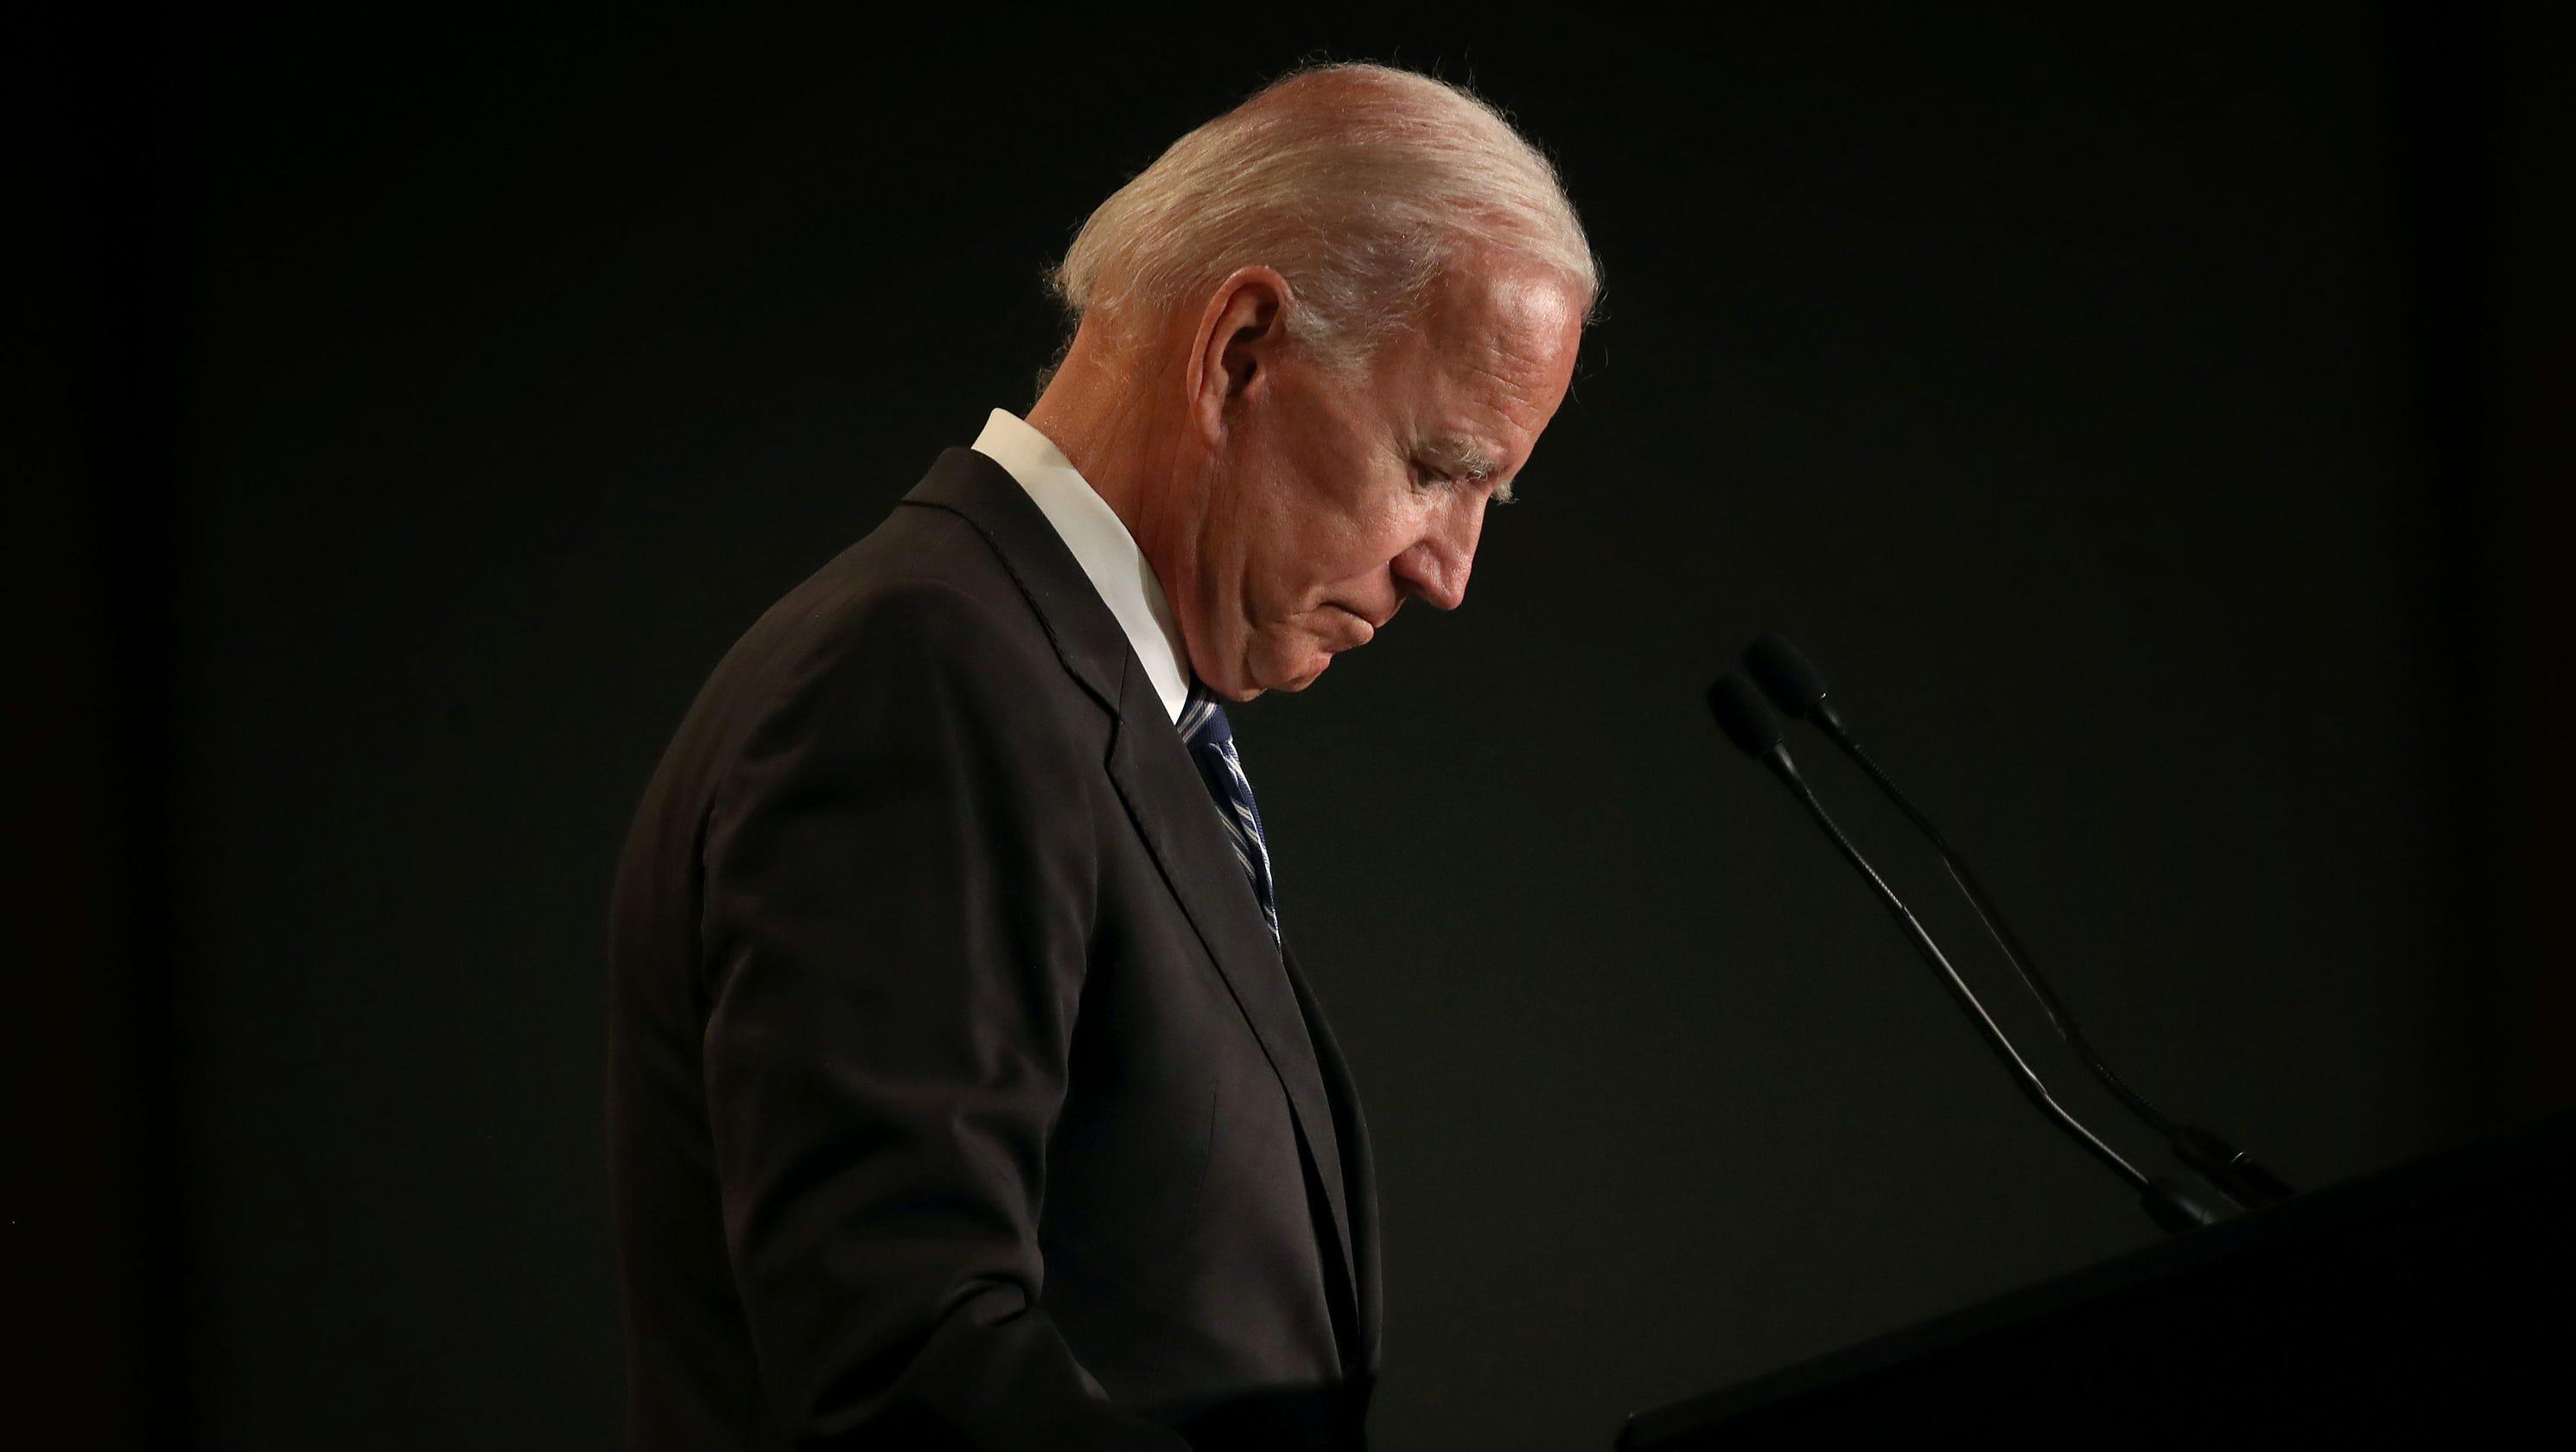 Joe Biden To Address Labor Group Amid Allegations On Improper Touching